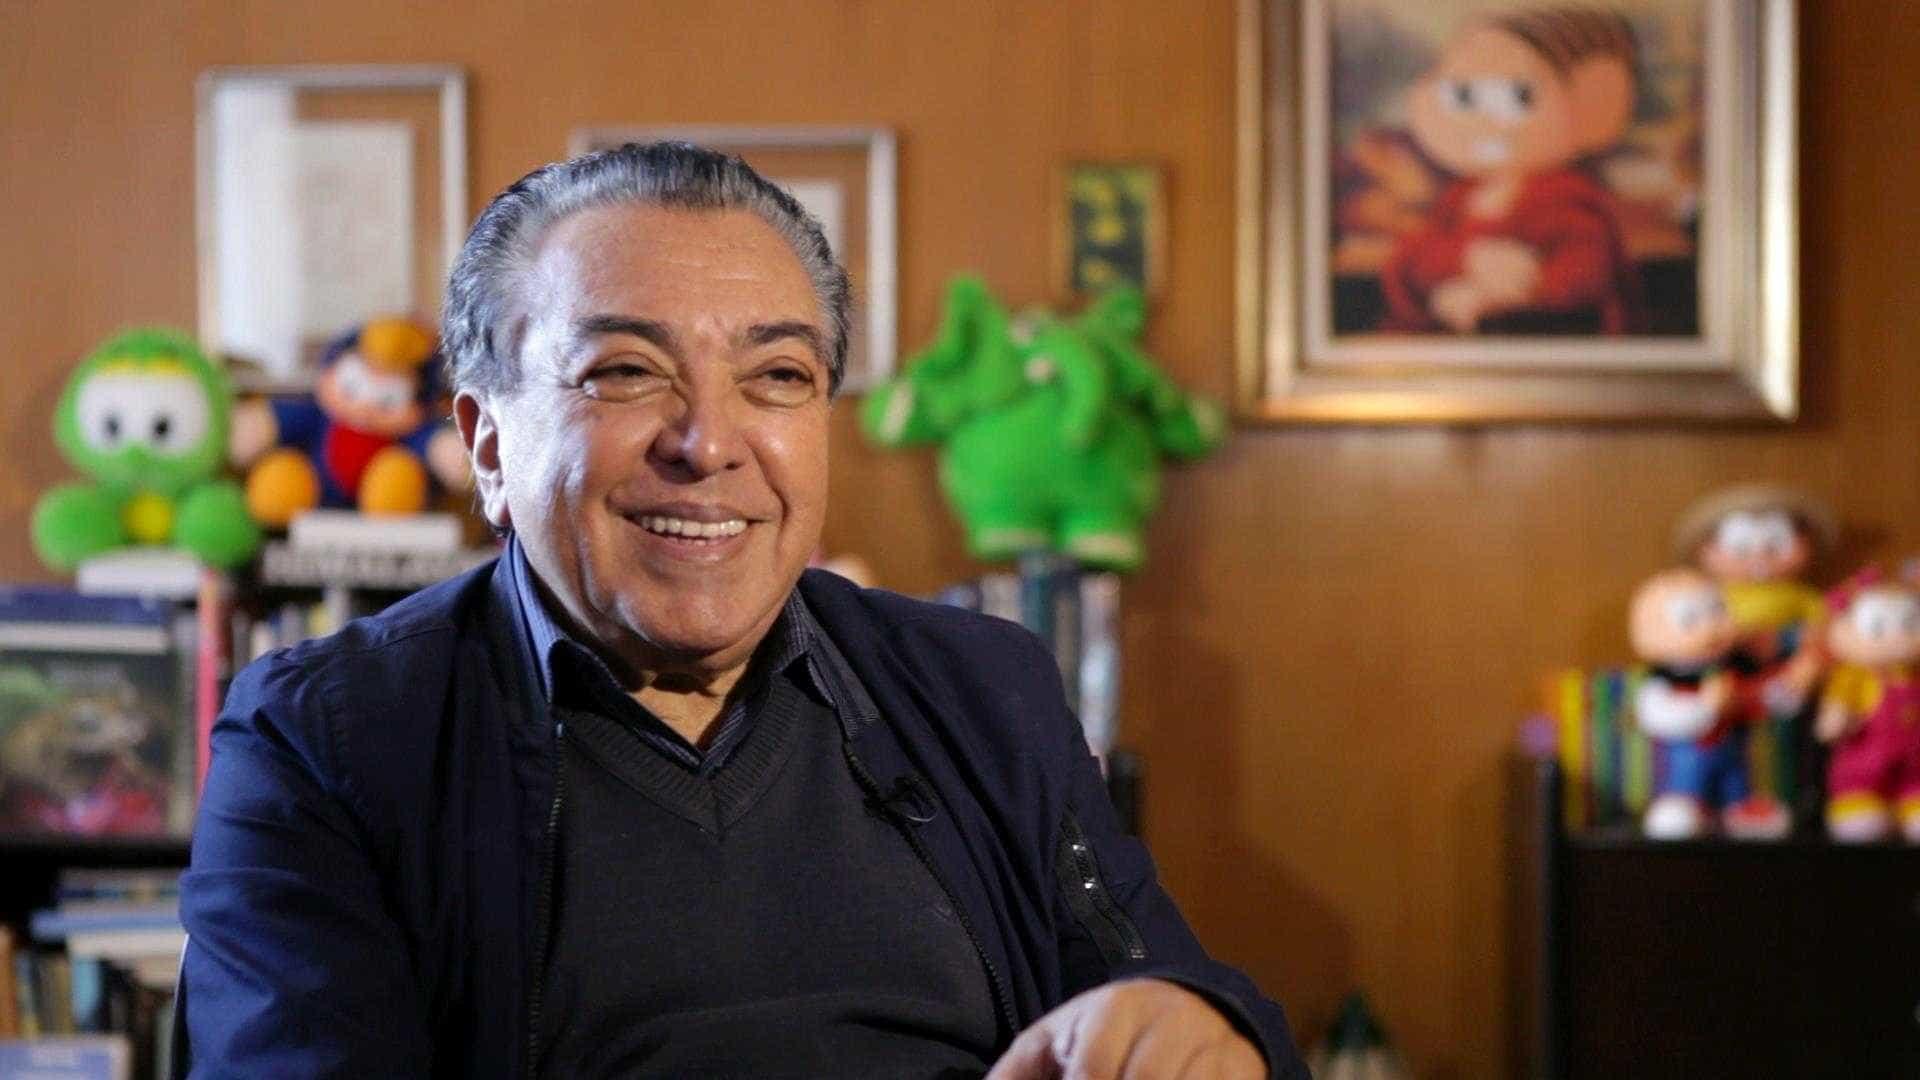 Hoje é dia de cantar parabéns pelos 85 anos de Mauricio de Sousa